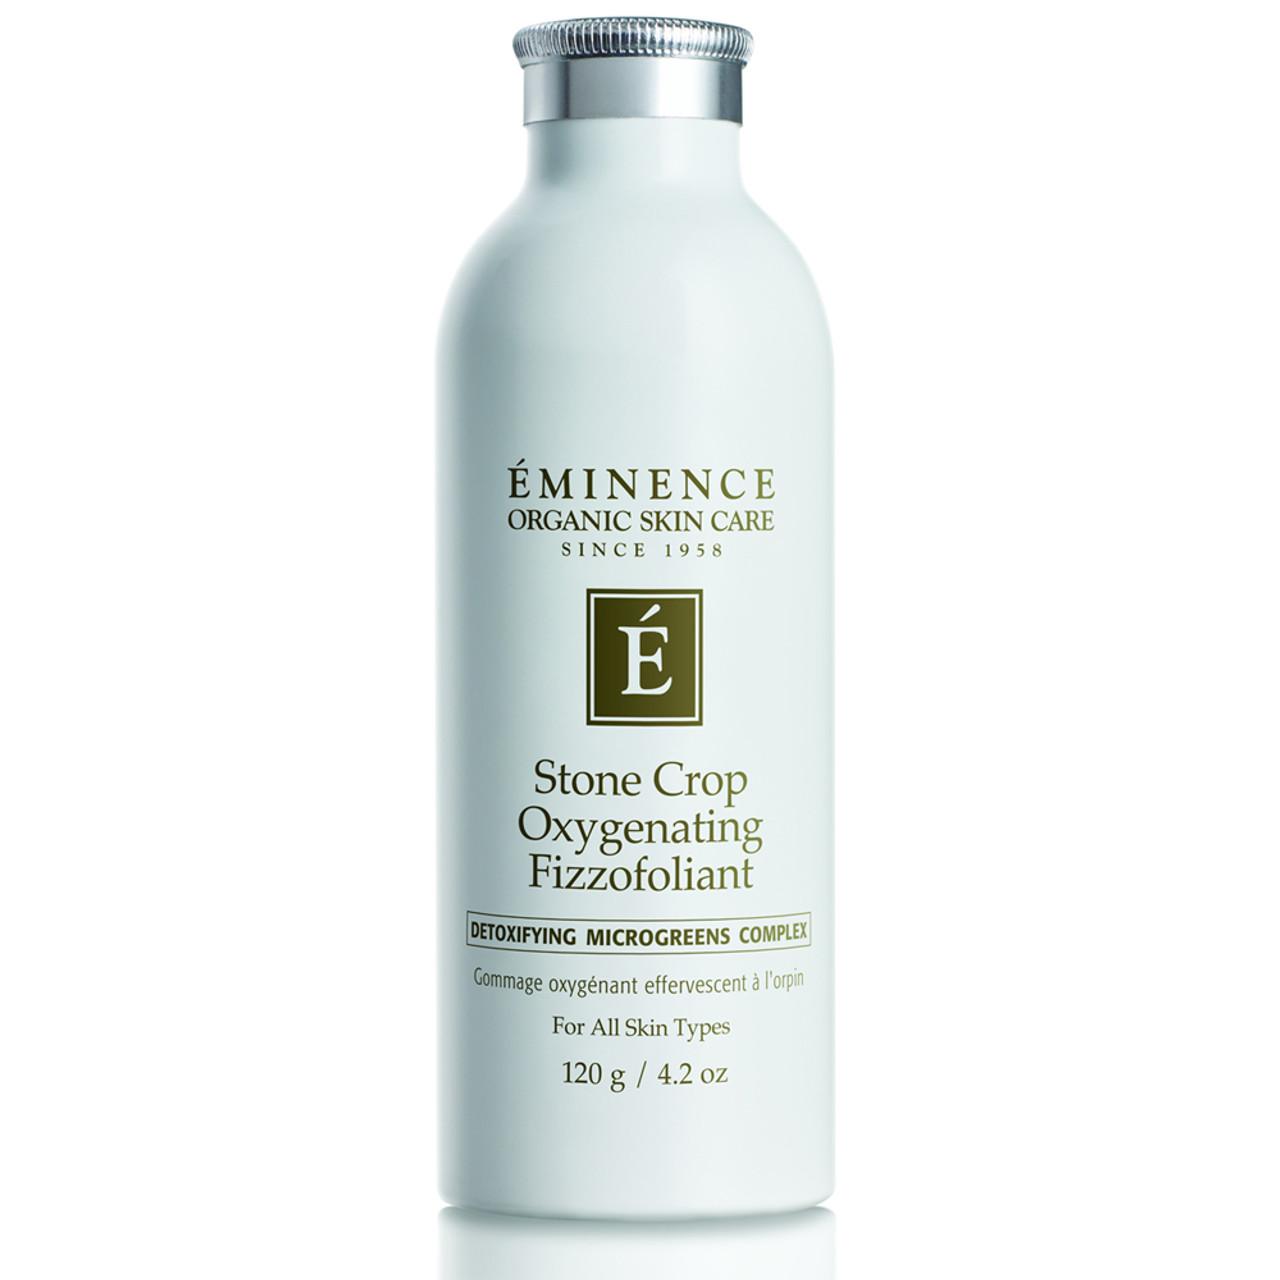 Eminence Stone Crop Oxygenating Fizzofoliant BeautifiedYou.com